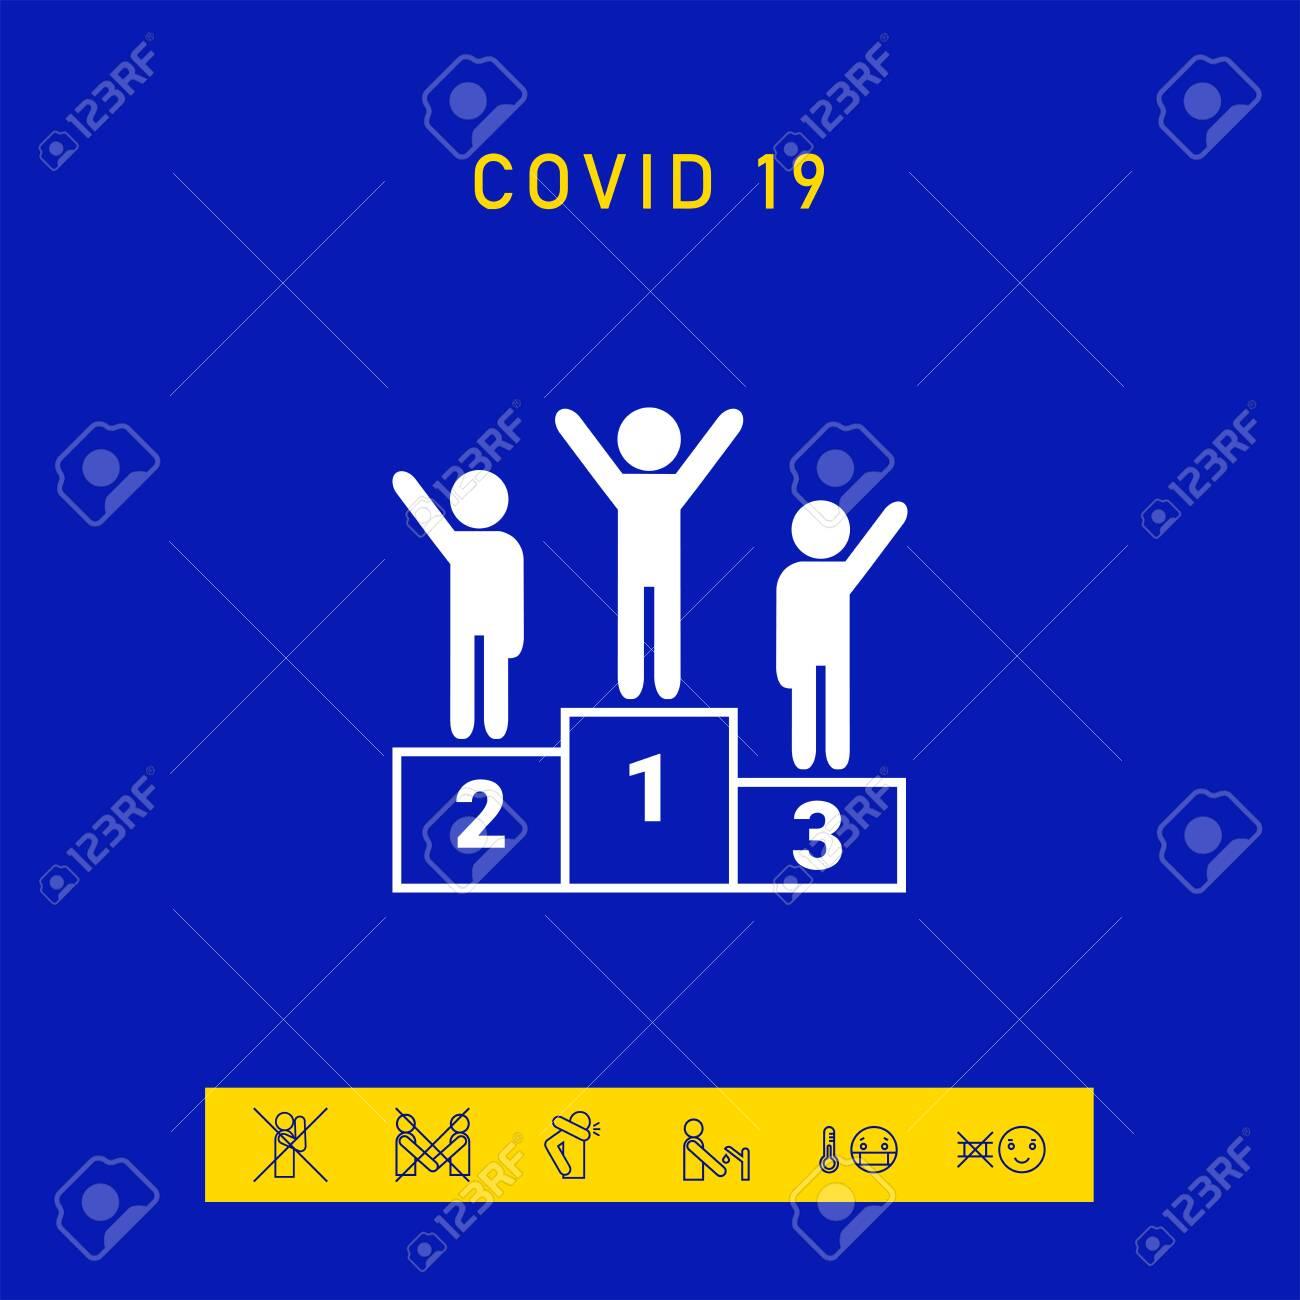 Pedestal - podium icon, elements for your design - 144674456